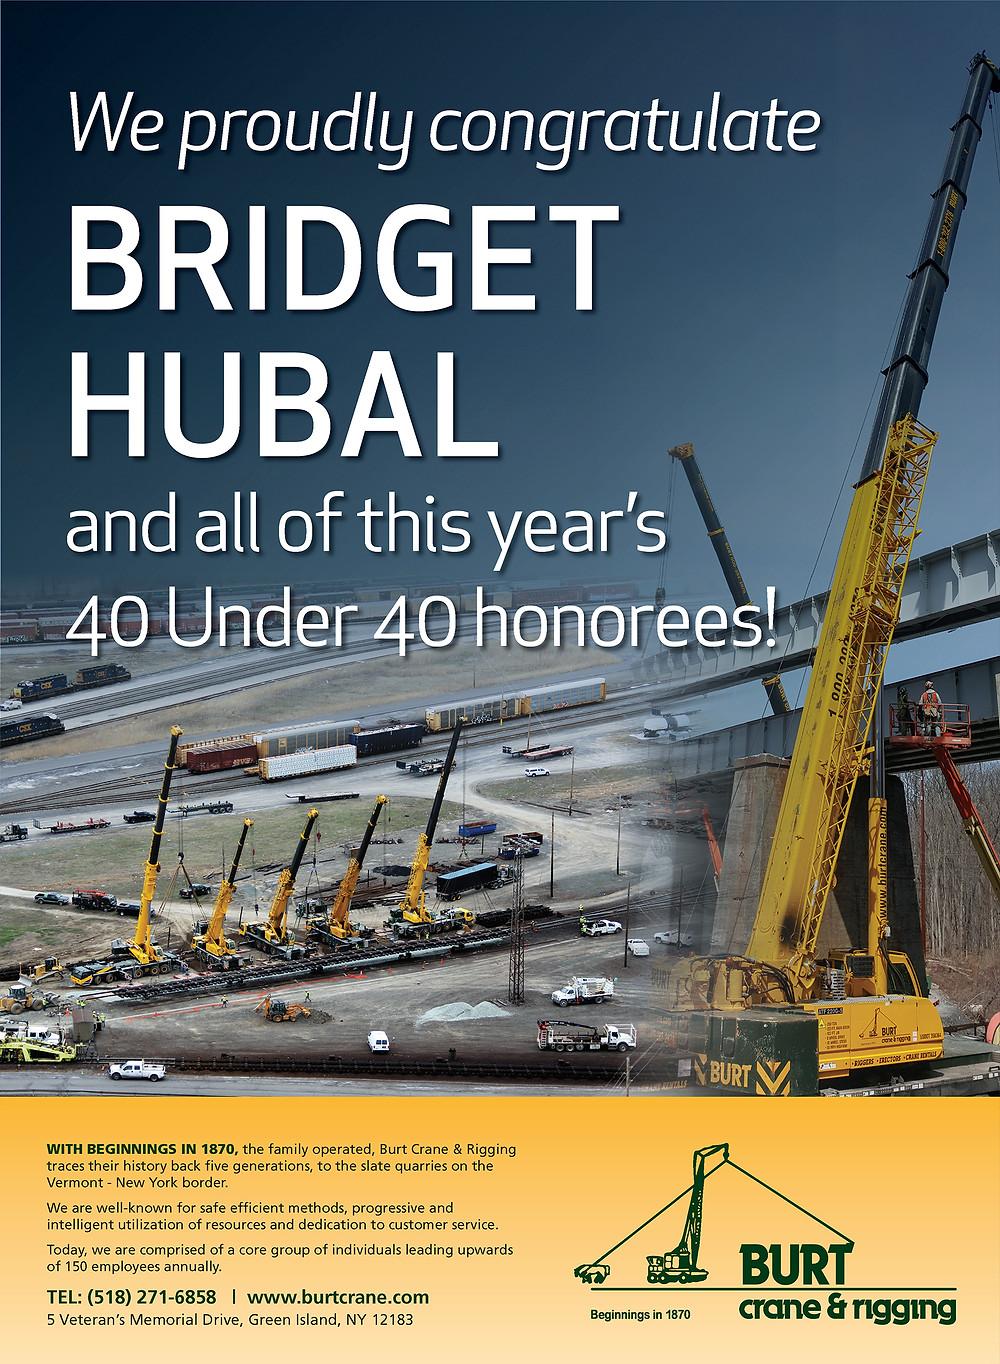 Burt crane and rigging Bridget Hubal